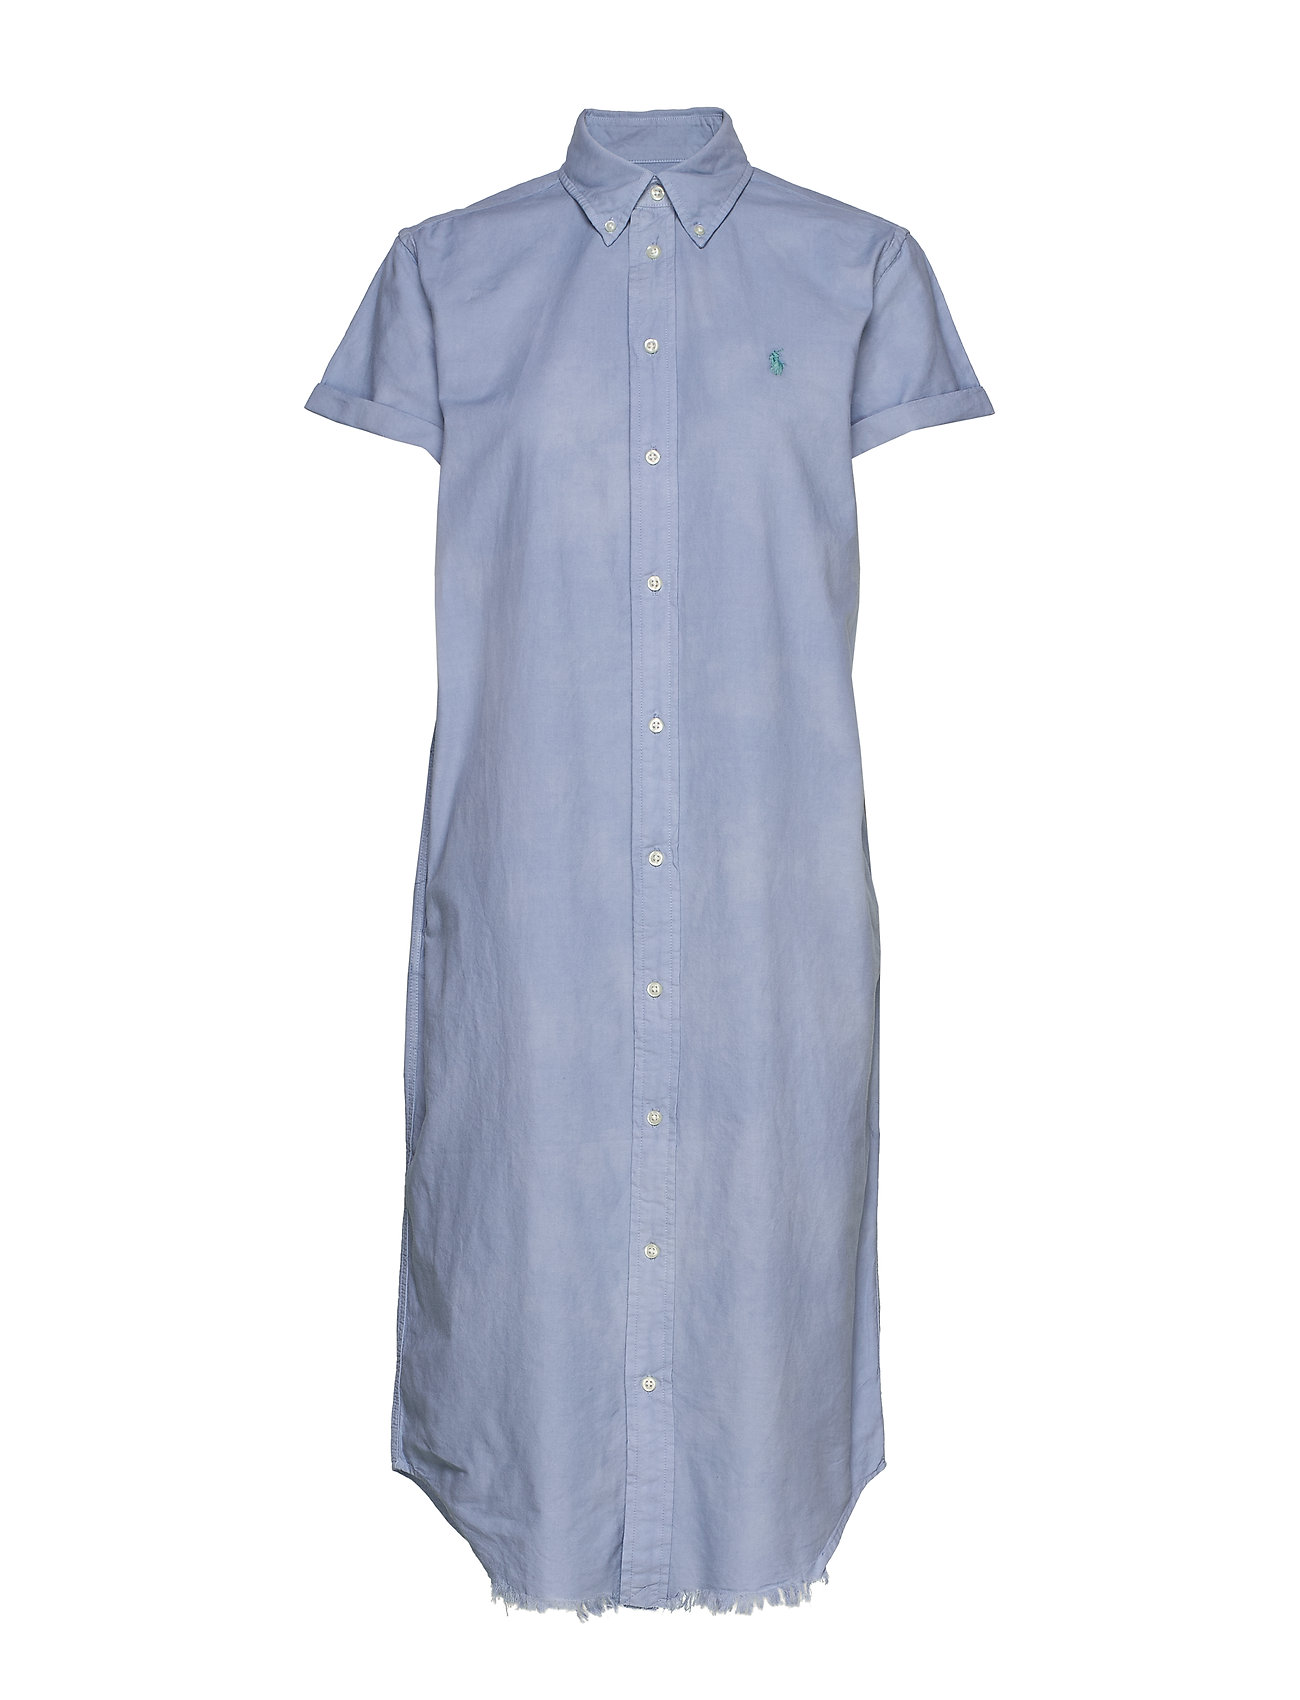 Polo Ralph Lauren Cotton Oxford Shirtdress - BLUE LAGOON